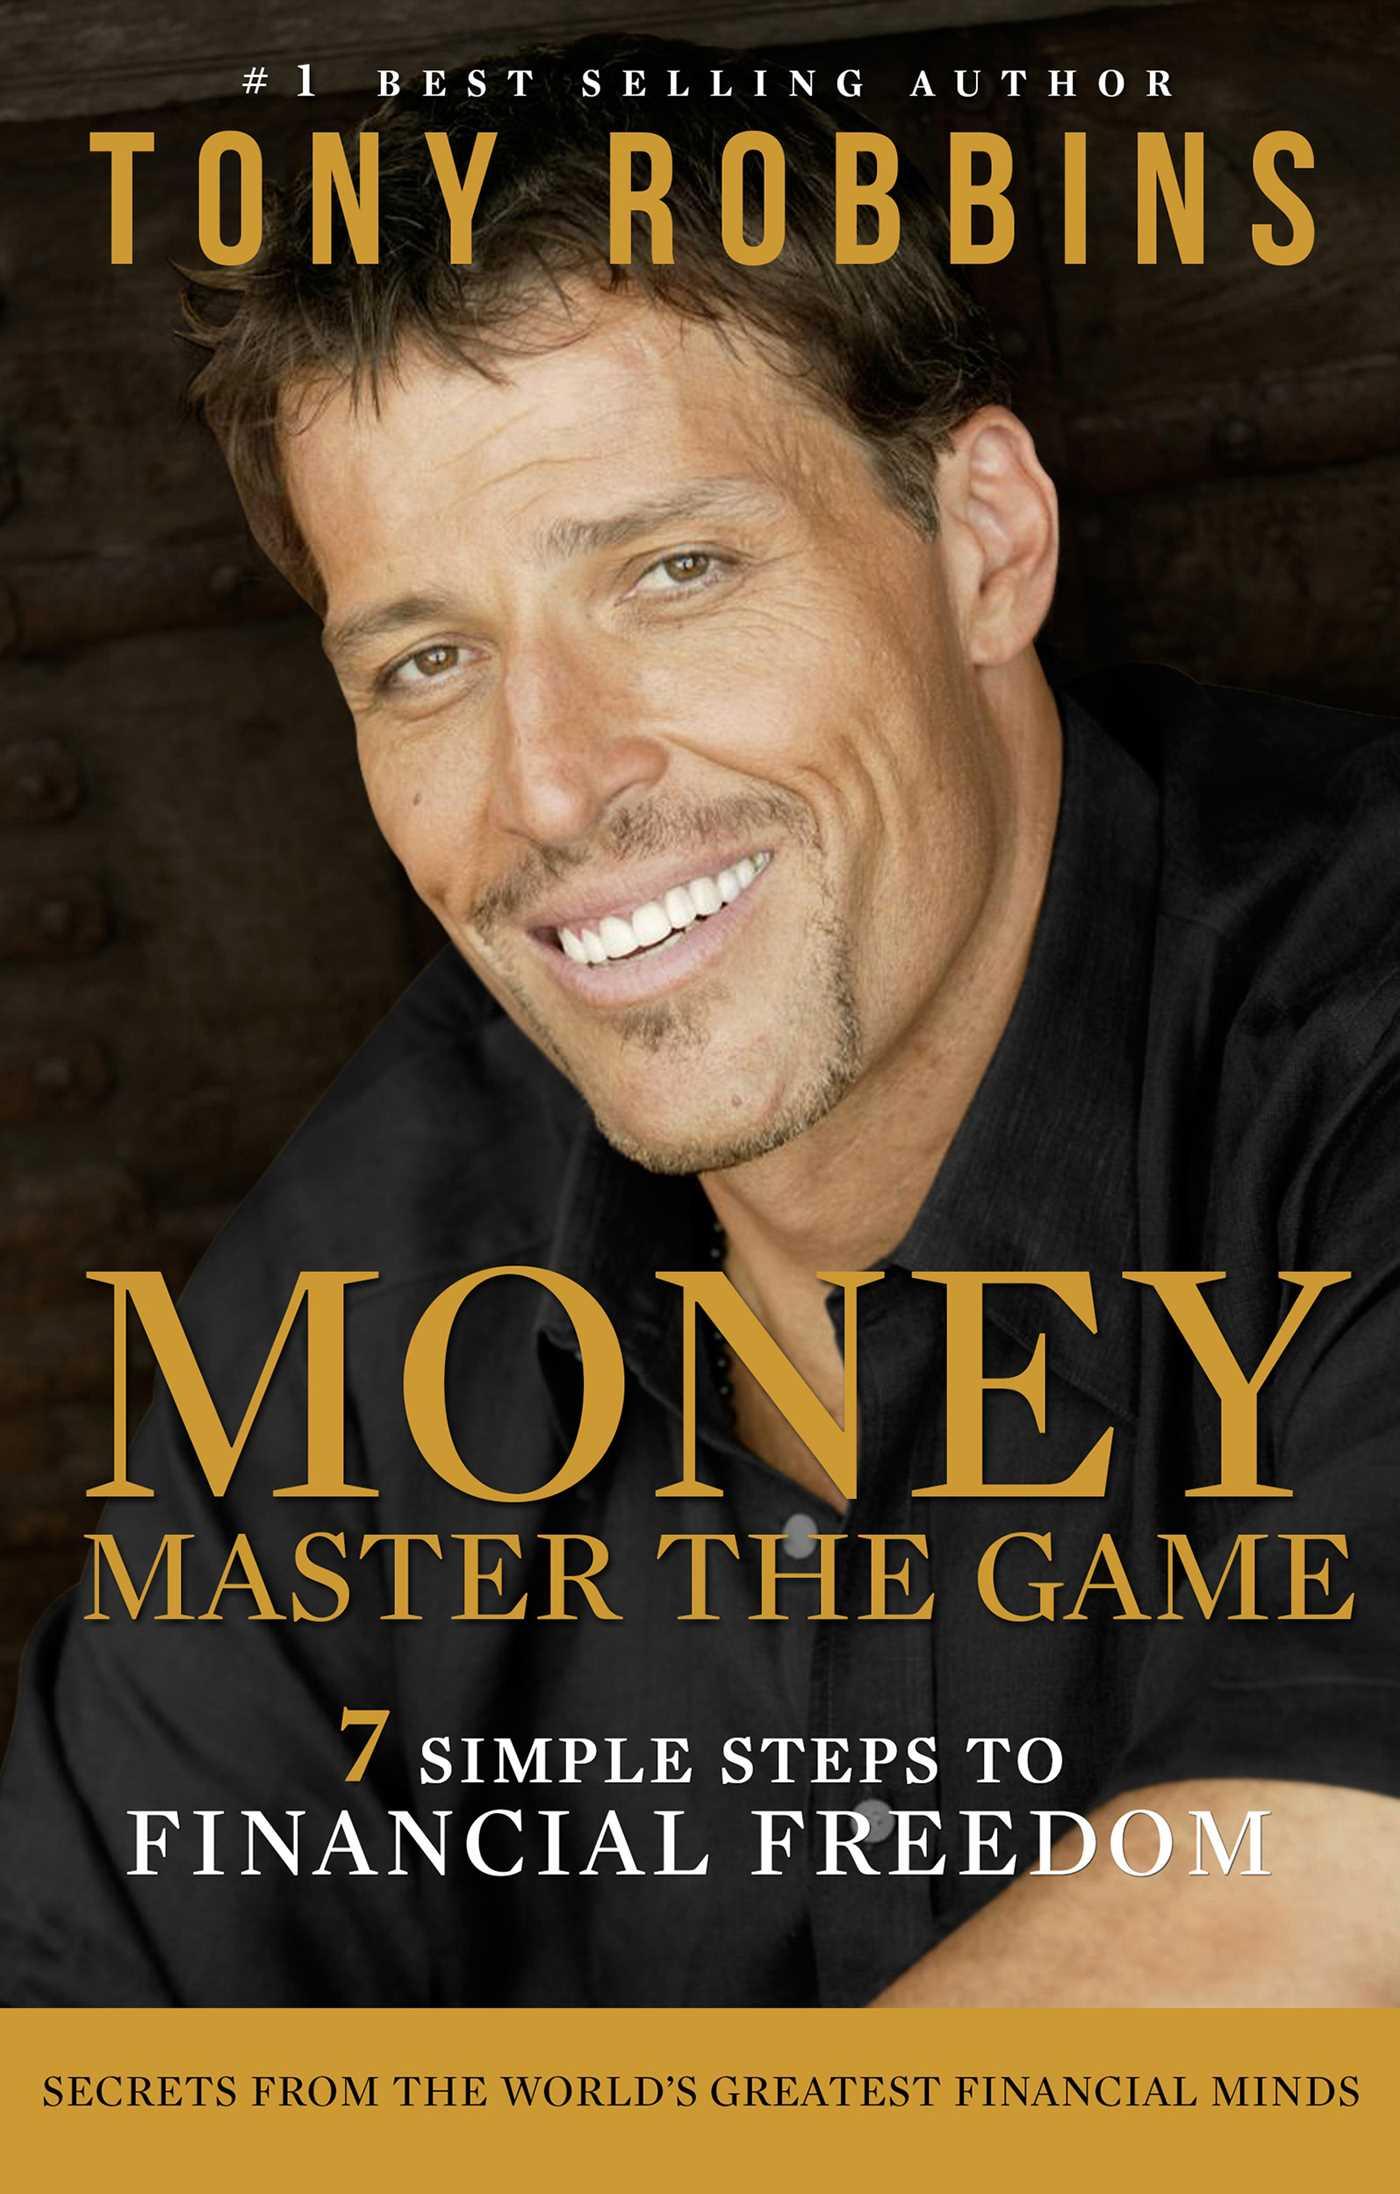 Money master the game 9781471148613 hr